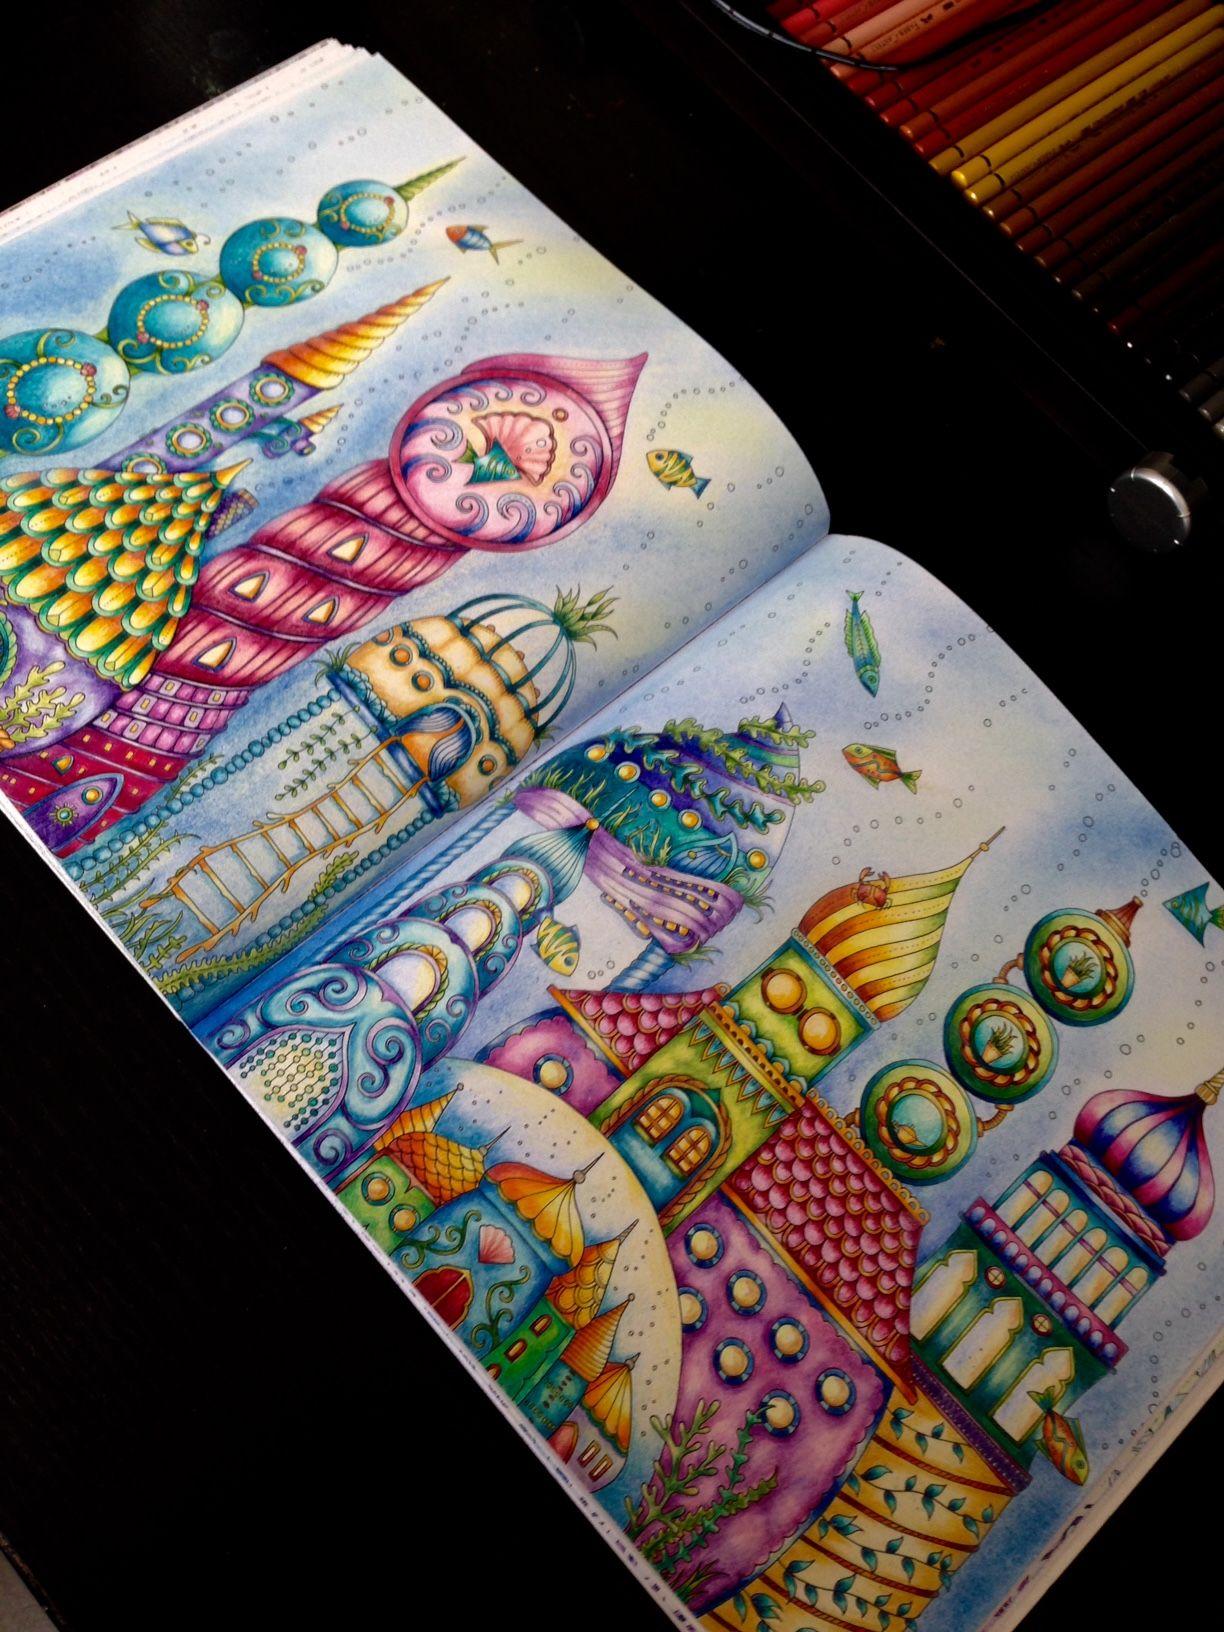 Lost Ocean Johanna Basford Inspiration Lost Ocean Coloring Book Johanna Basford Coloring Book Basford Coloring